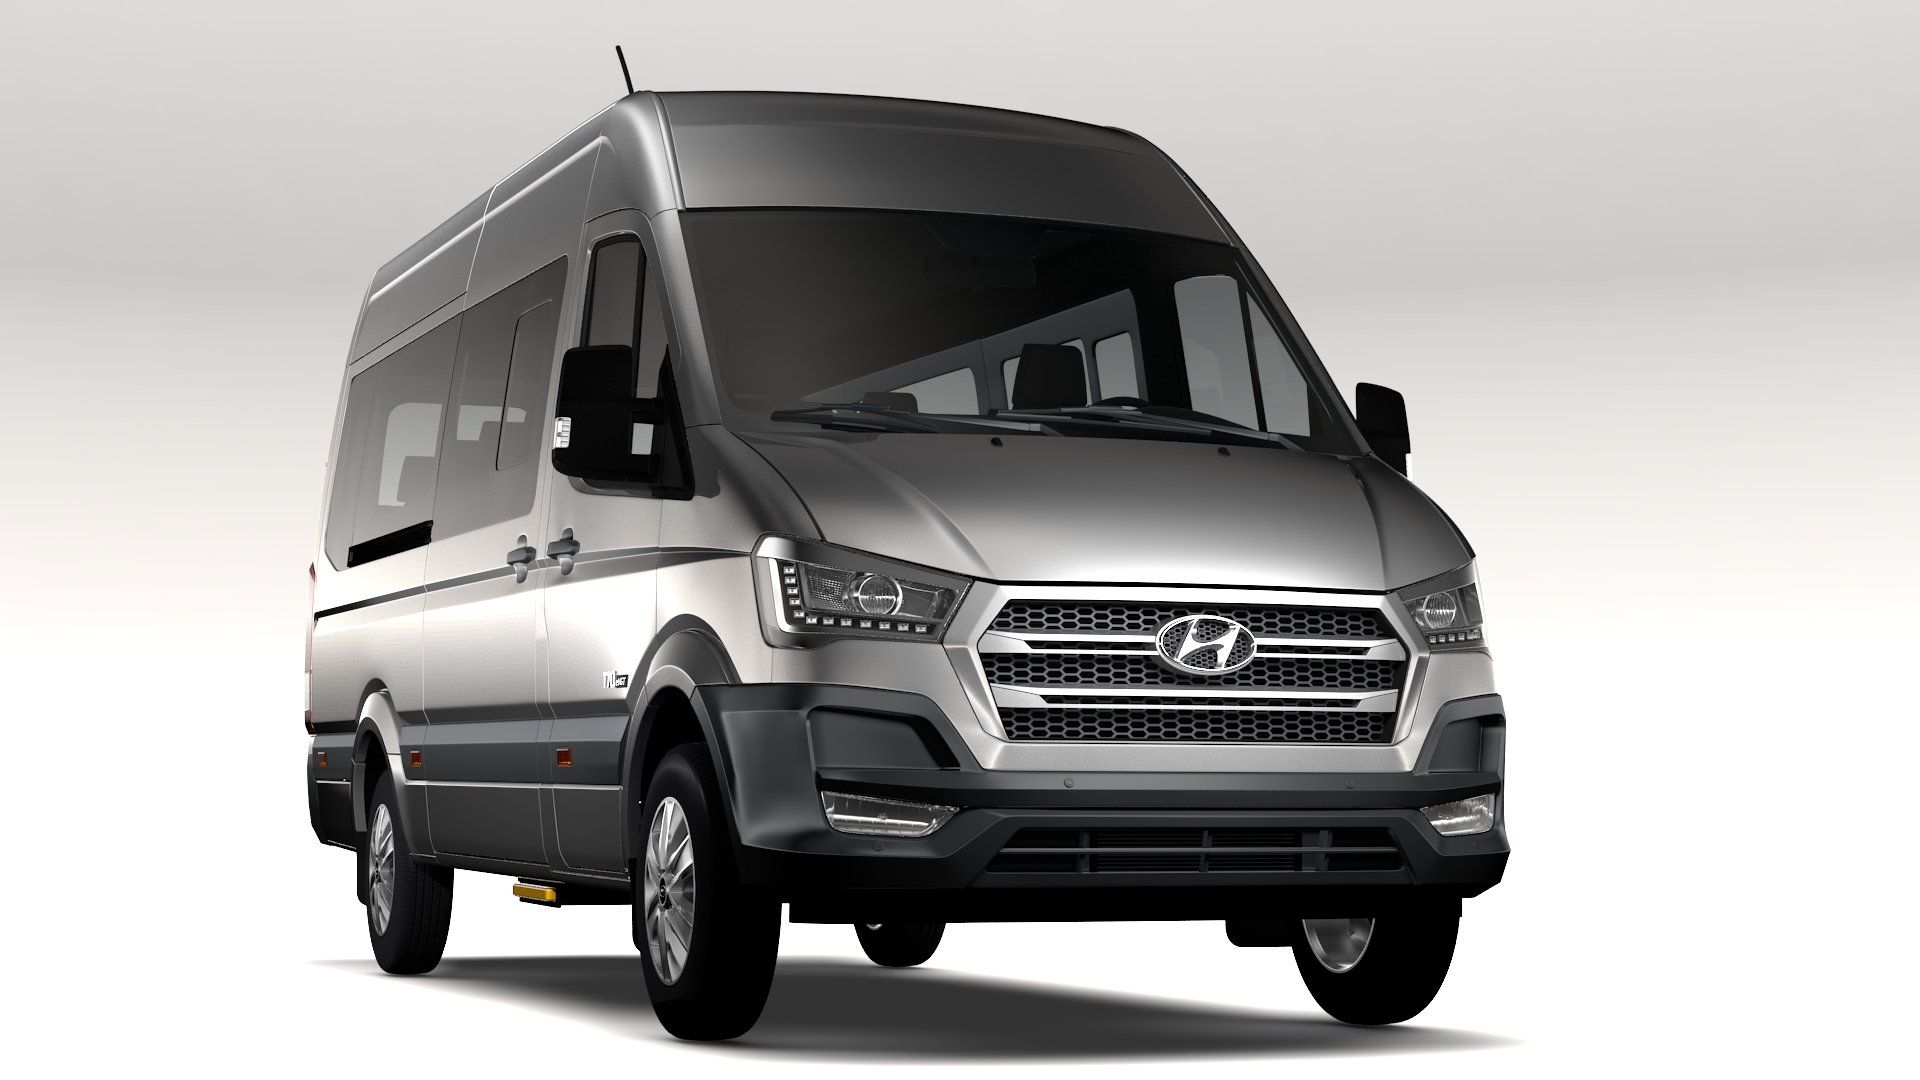 Hyundai H350 Minibus 2017 Team Models Hyundai Mini Bus